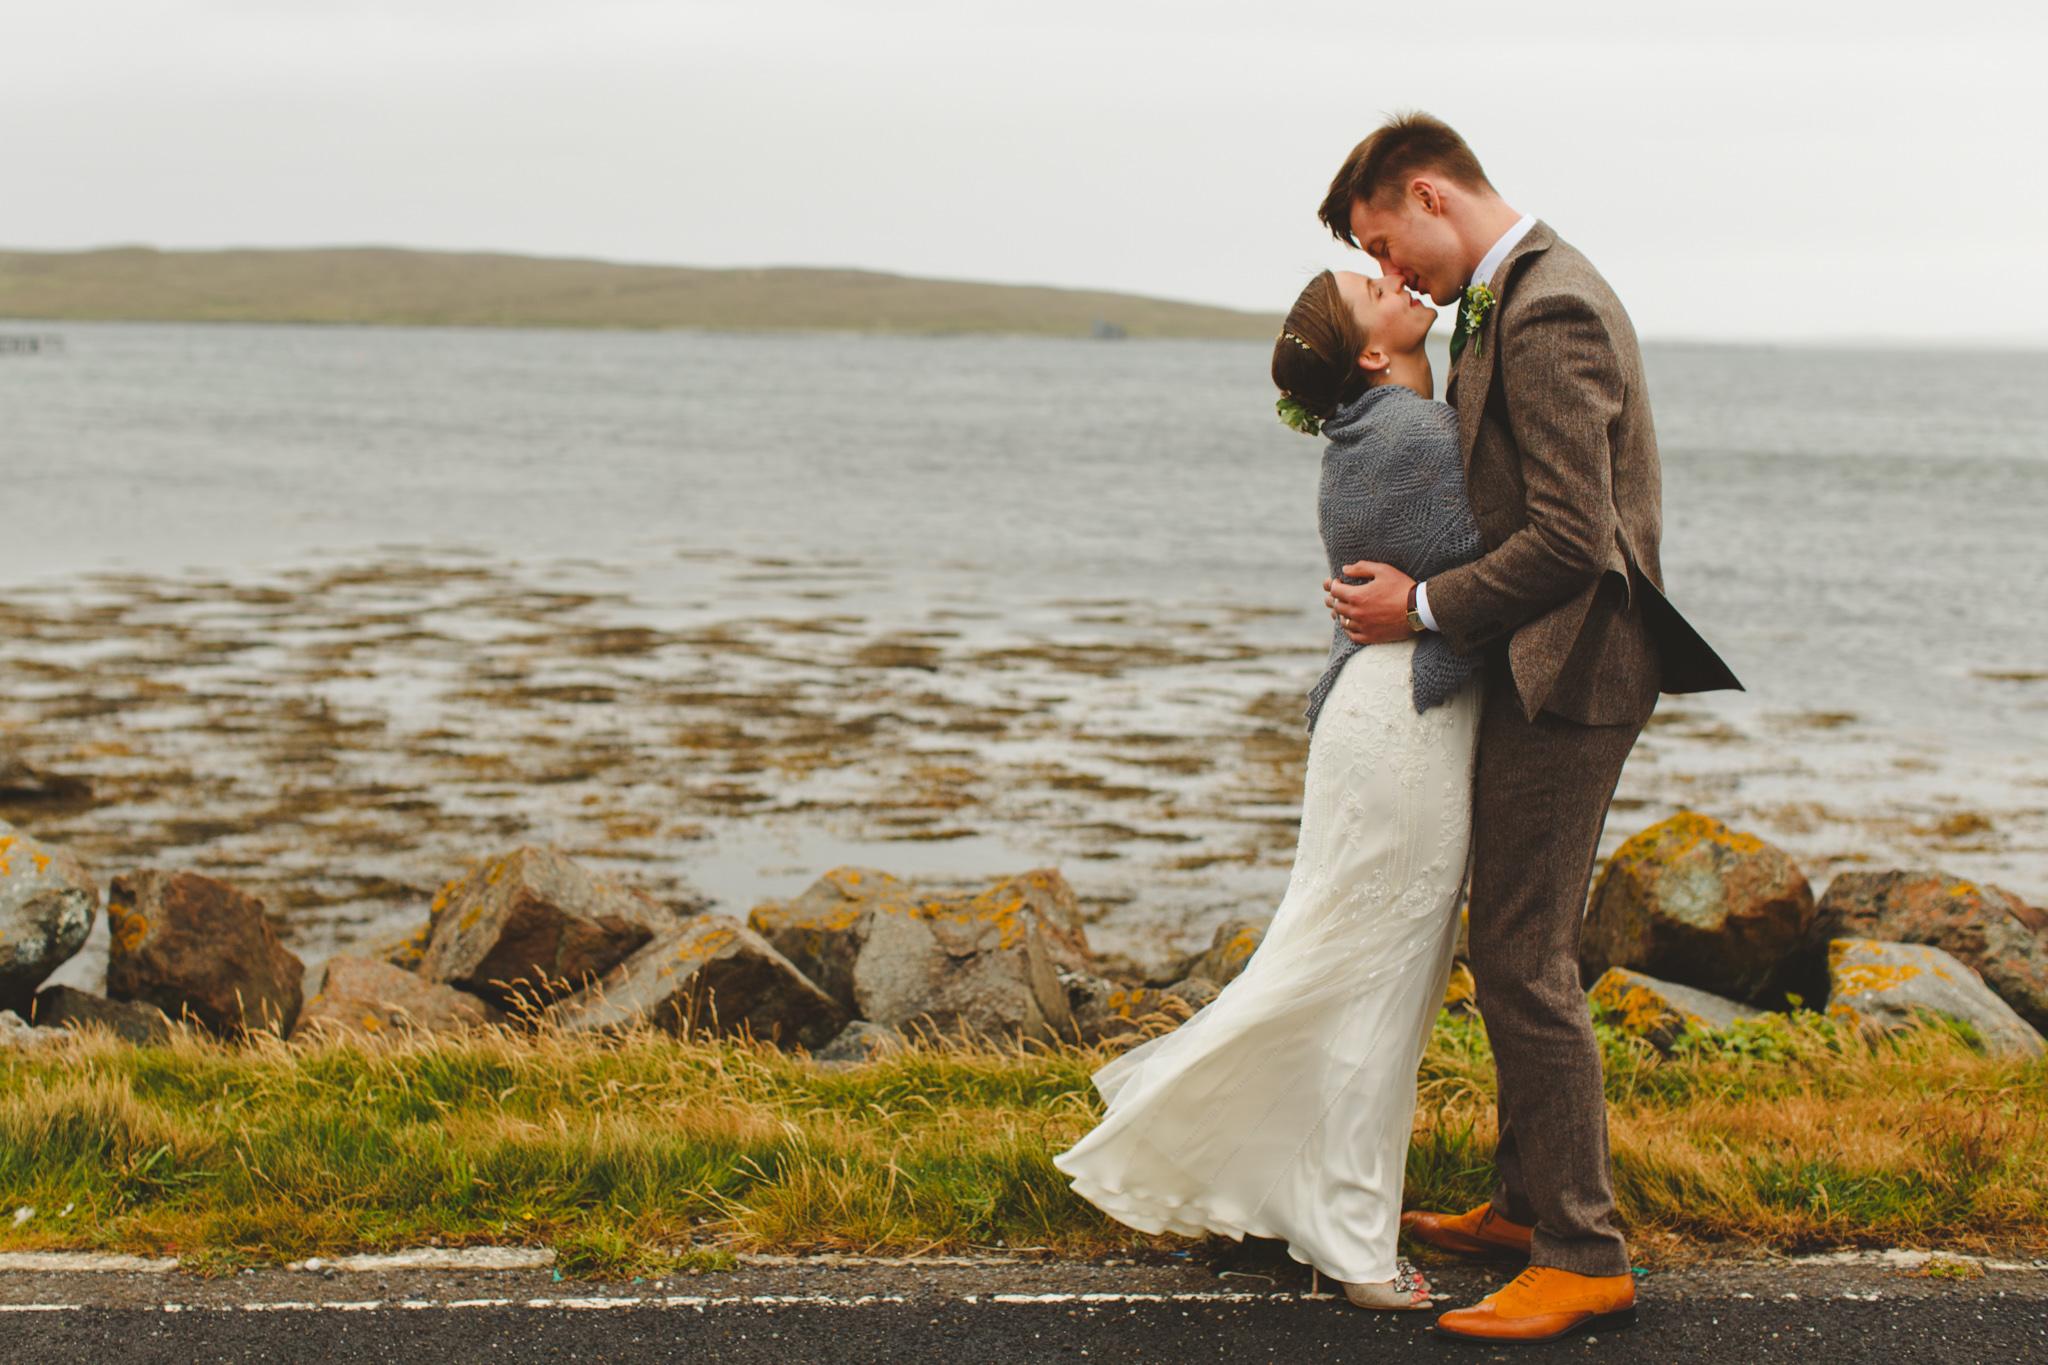 derbyshire-wedding-photographer-videographer-camera-hannah-21.jpg